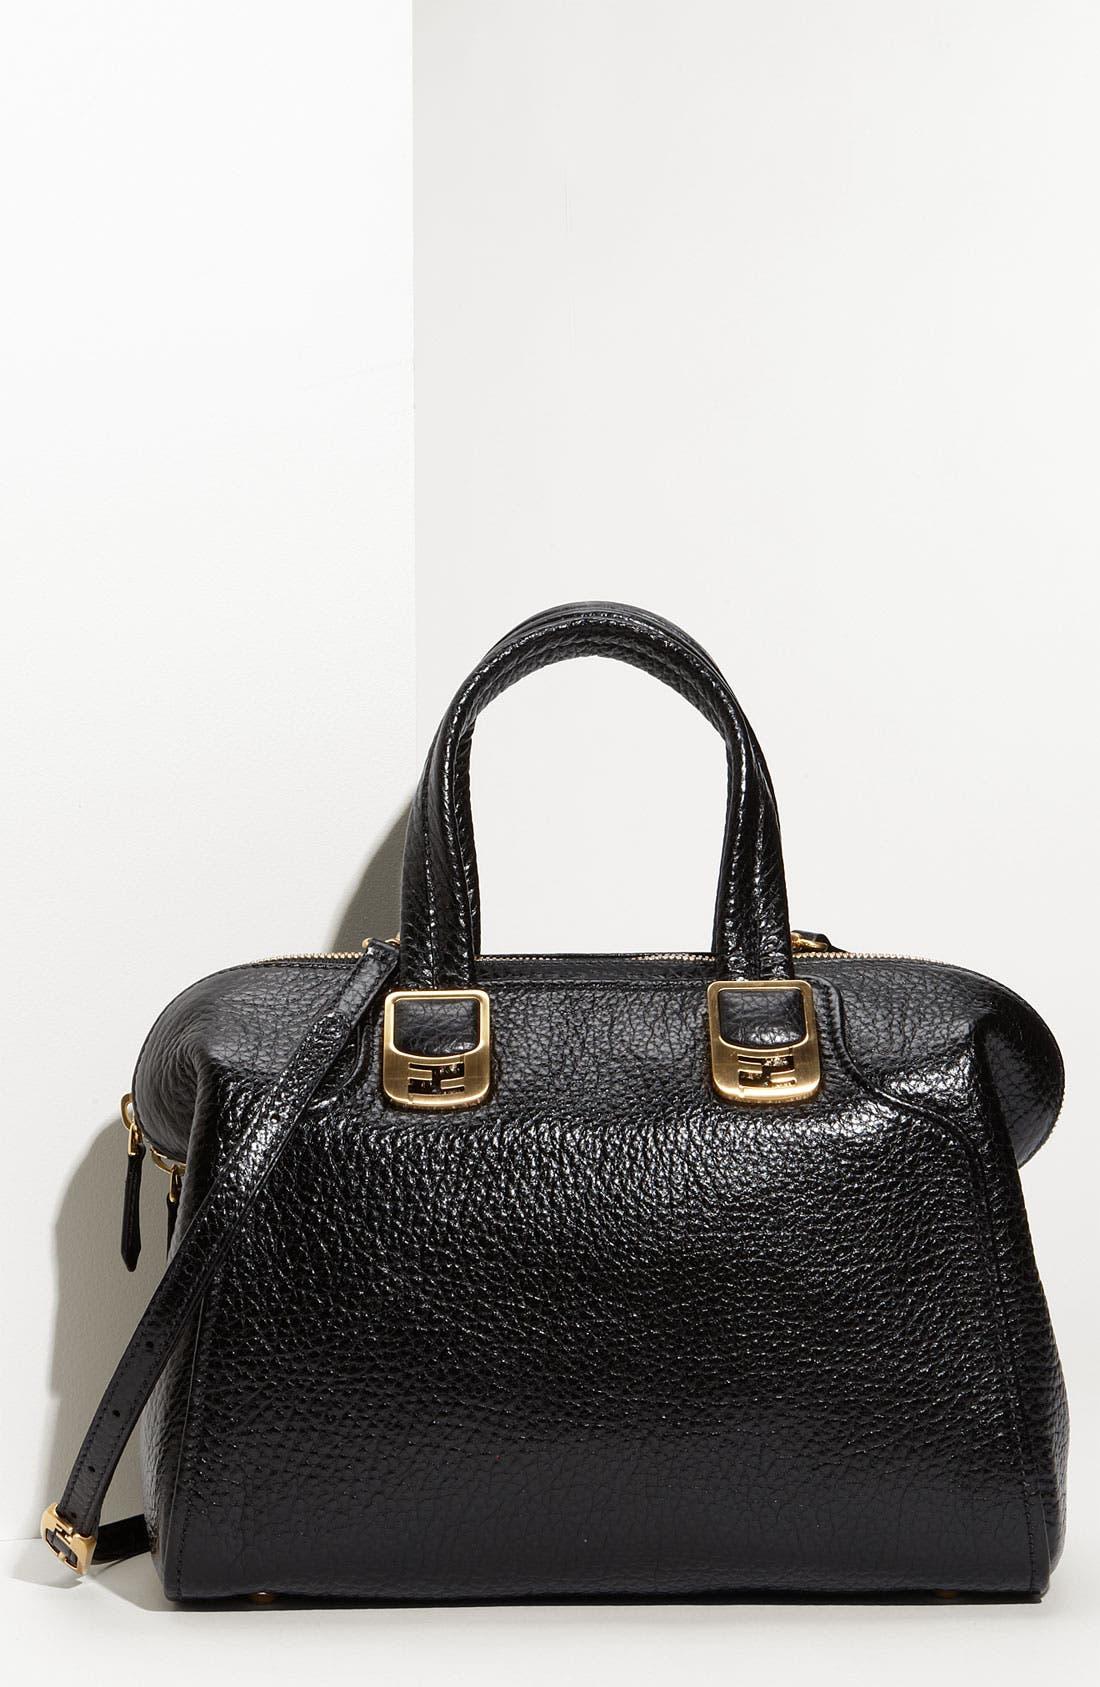 Main Image - Fendi 'Chameleon - Small' Leather Tote